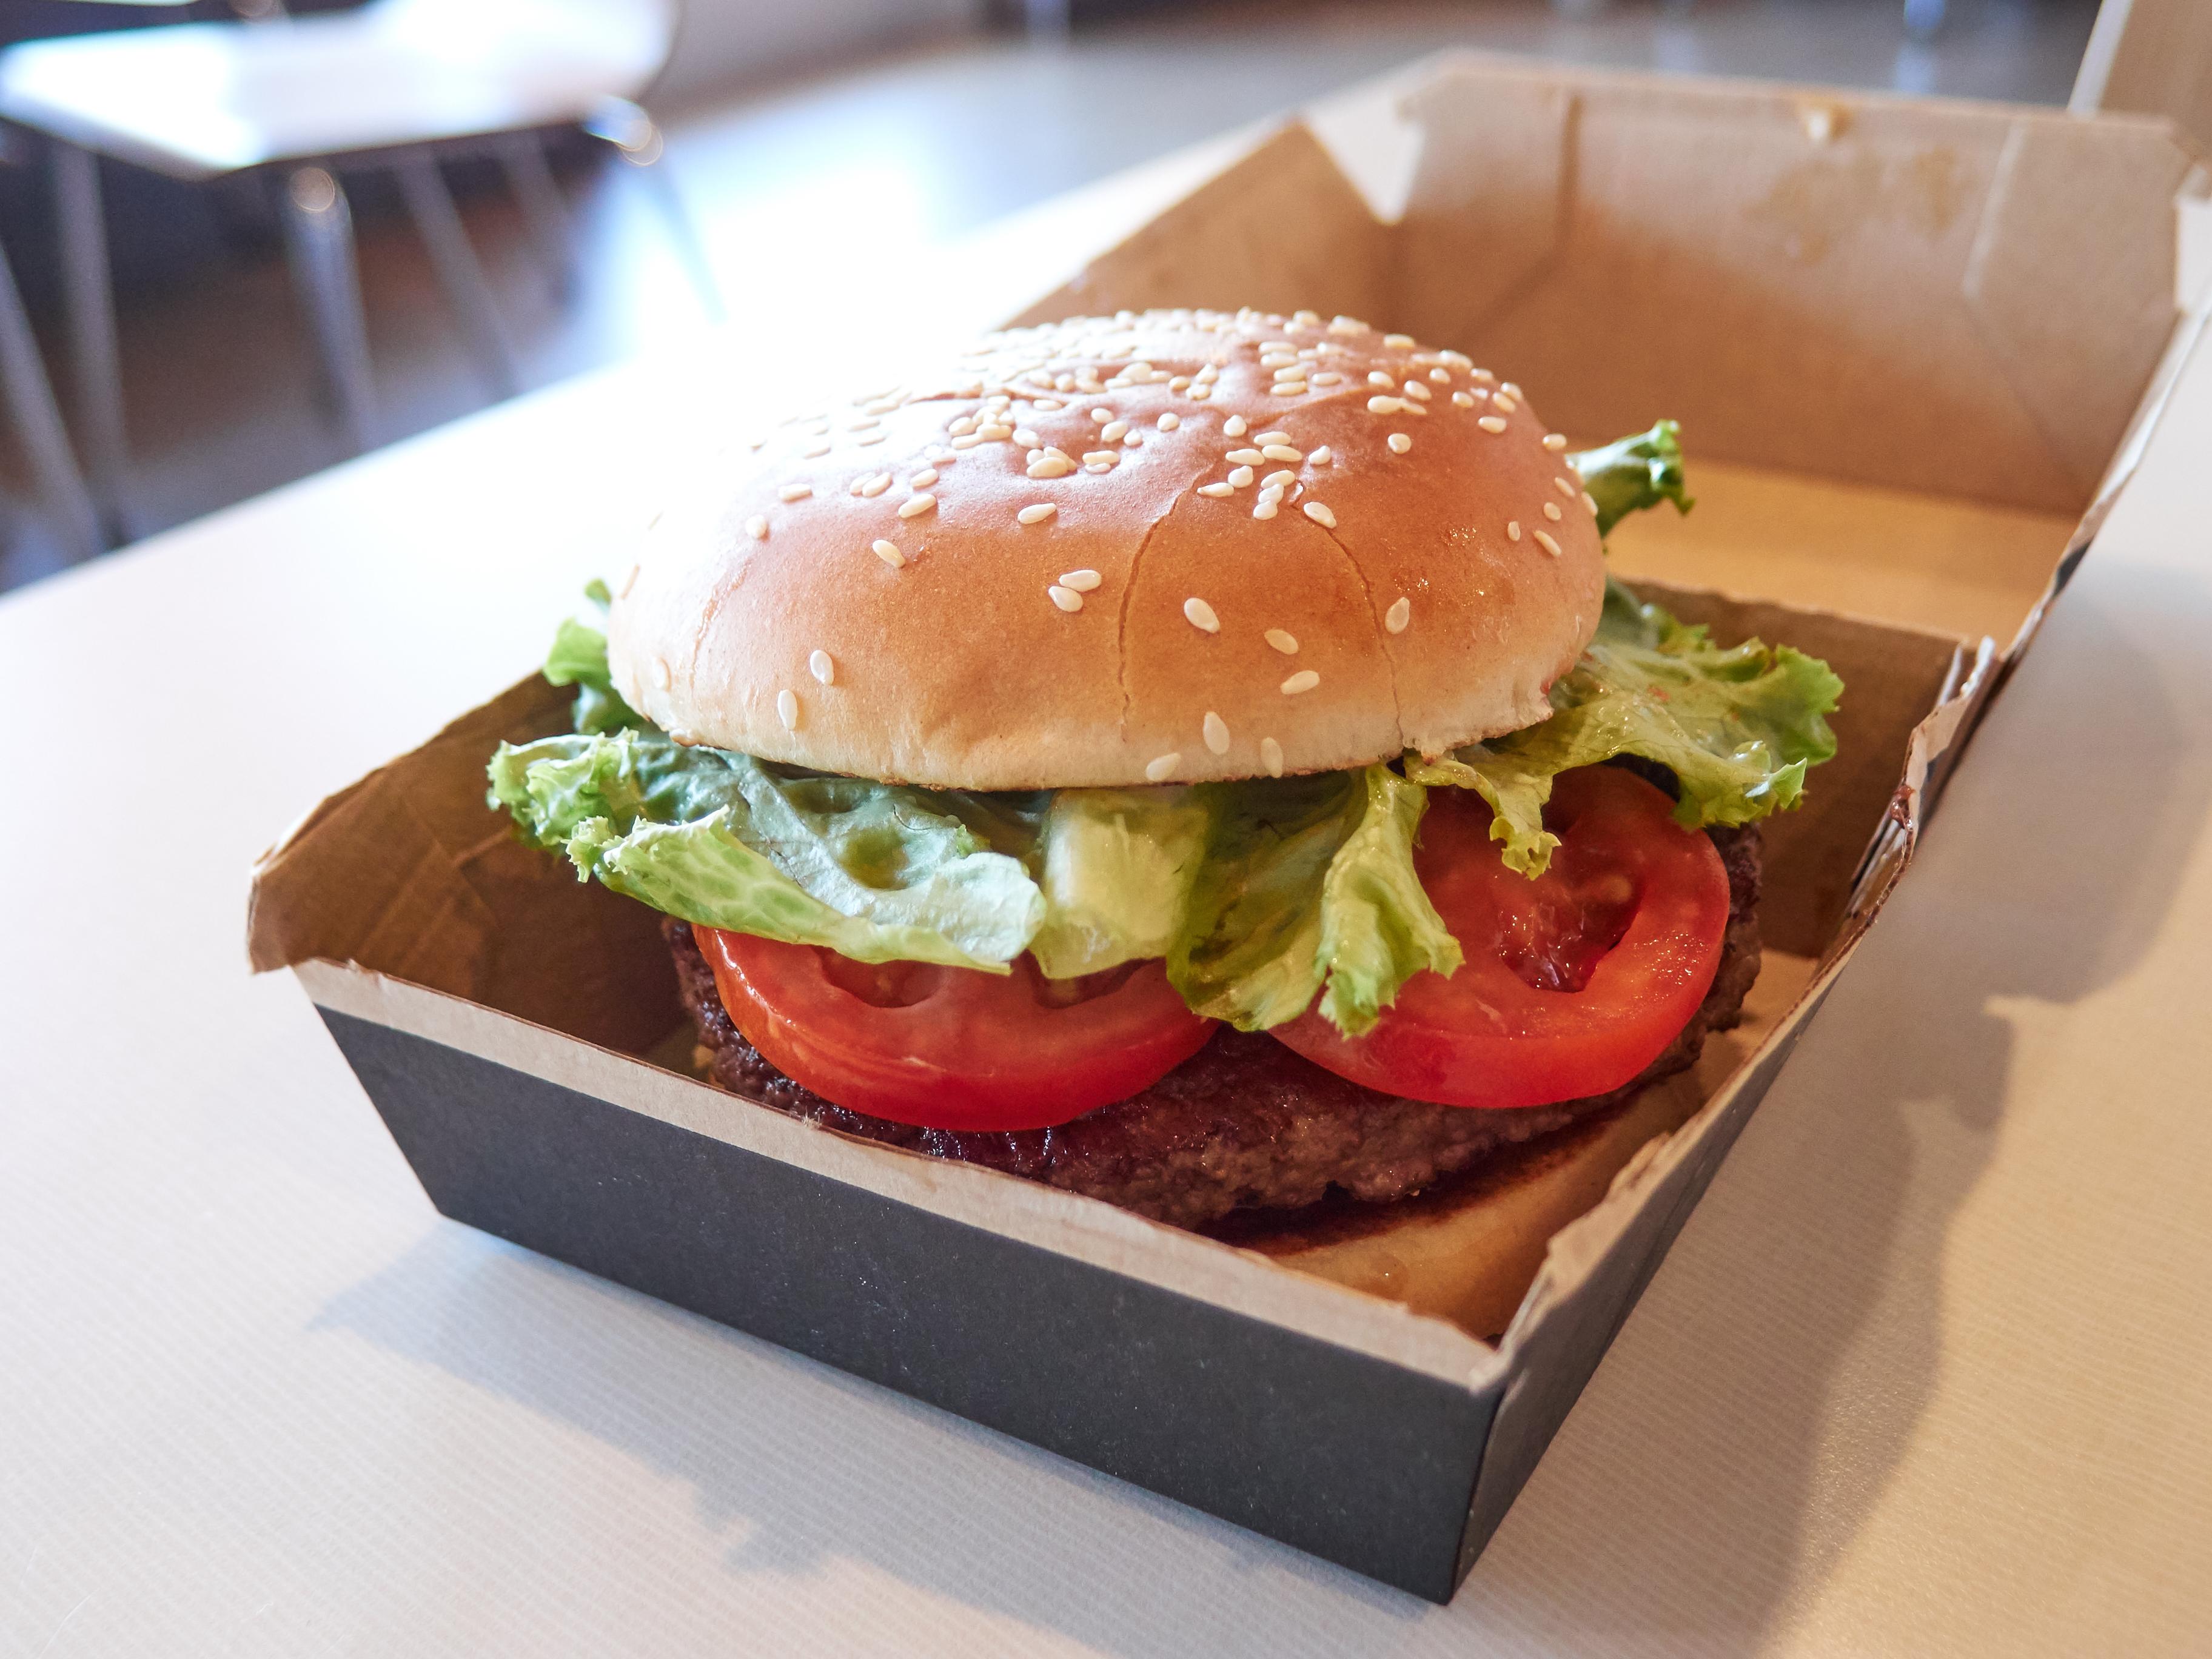 Quarter Pounder Deluxe, McDonald's - Austin, Texas